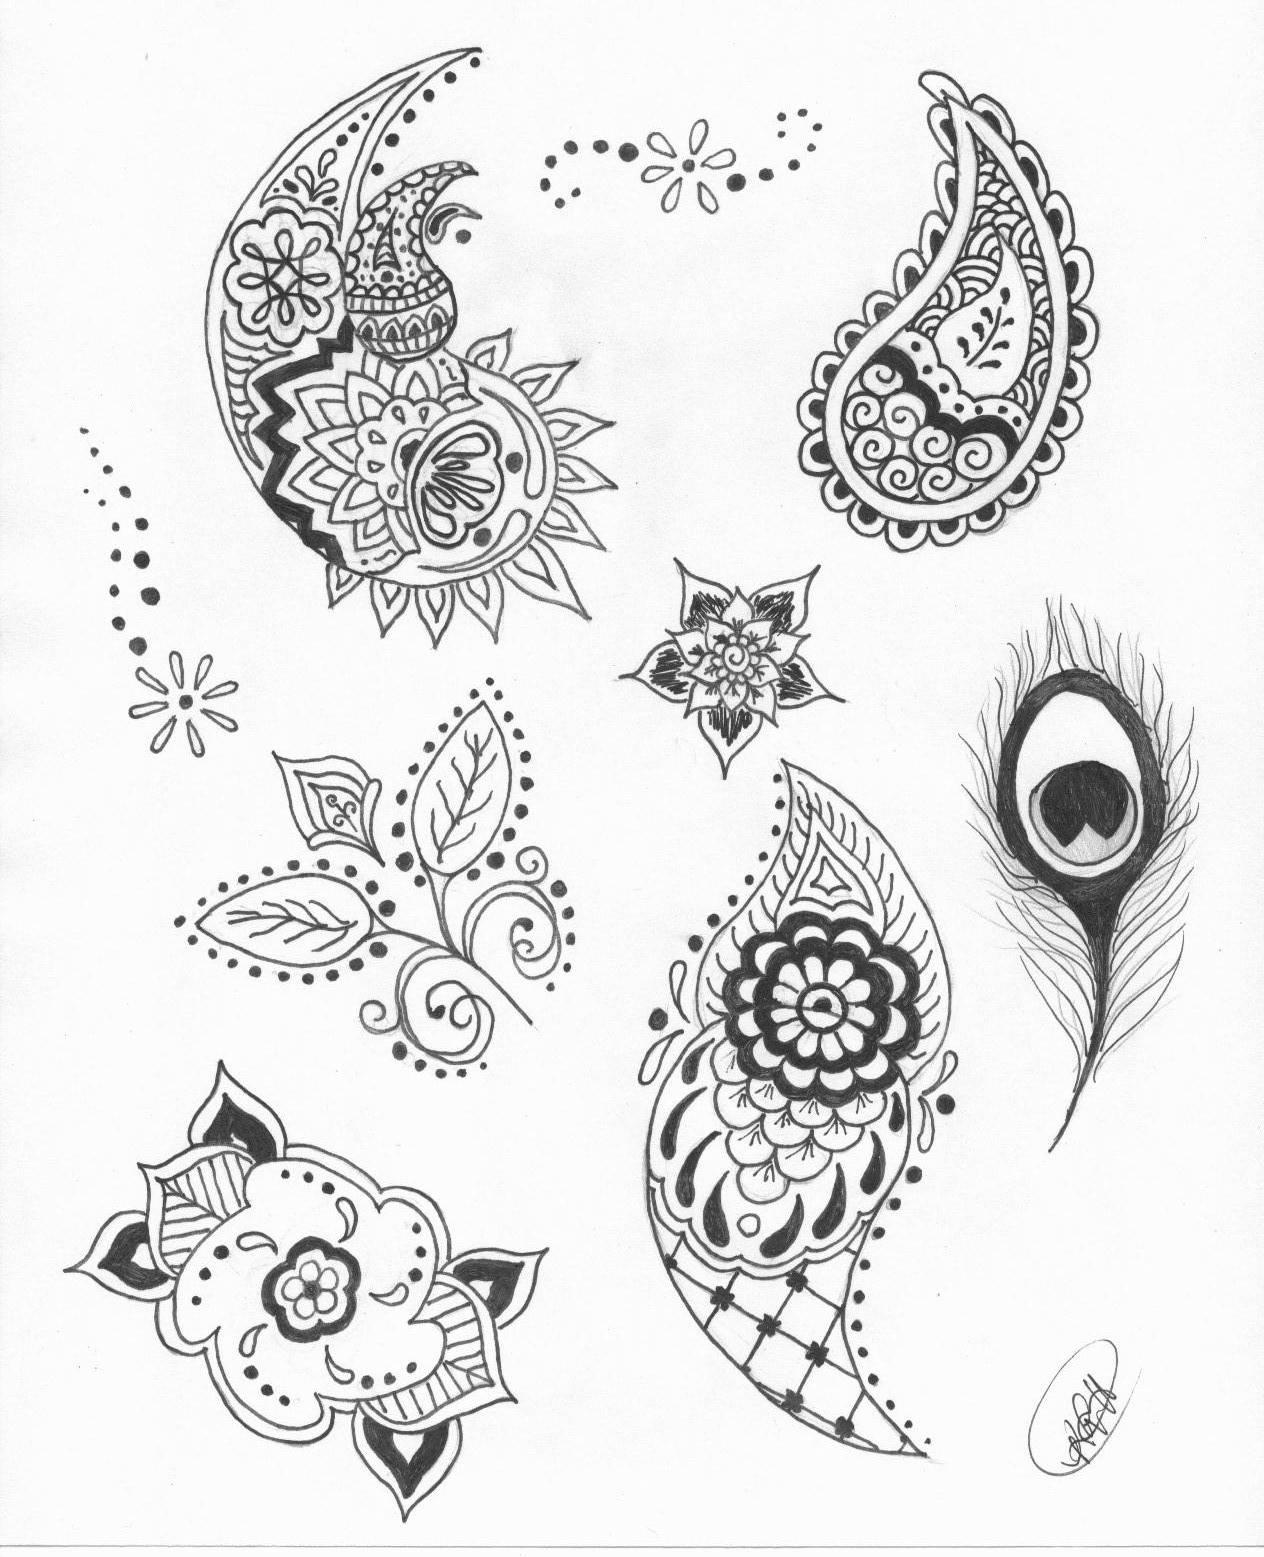 Mehndidesignsclub All About Mehndi Designs 11 04 11